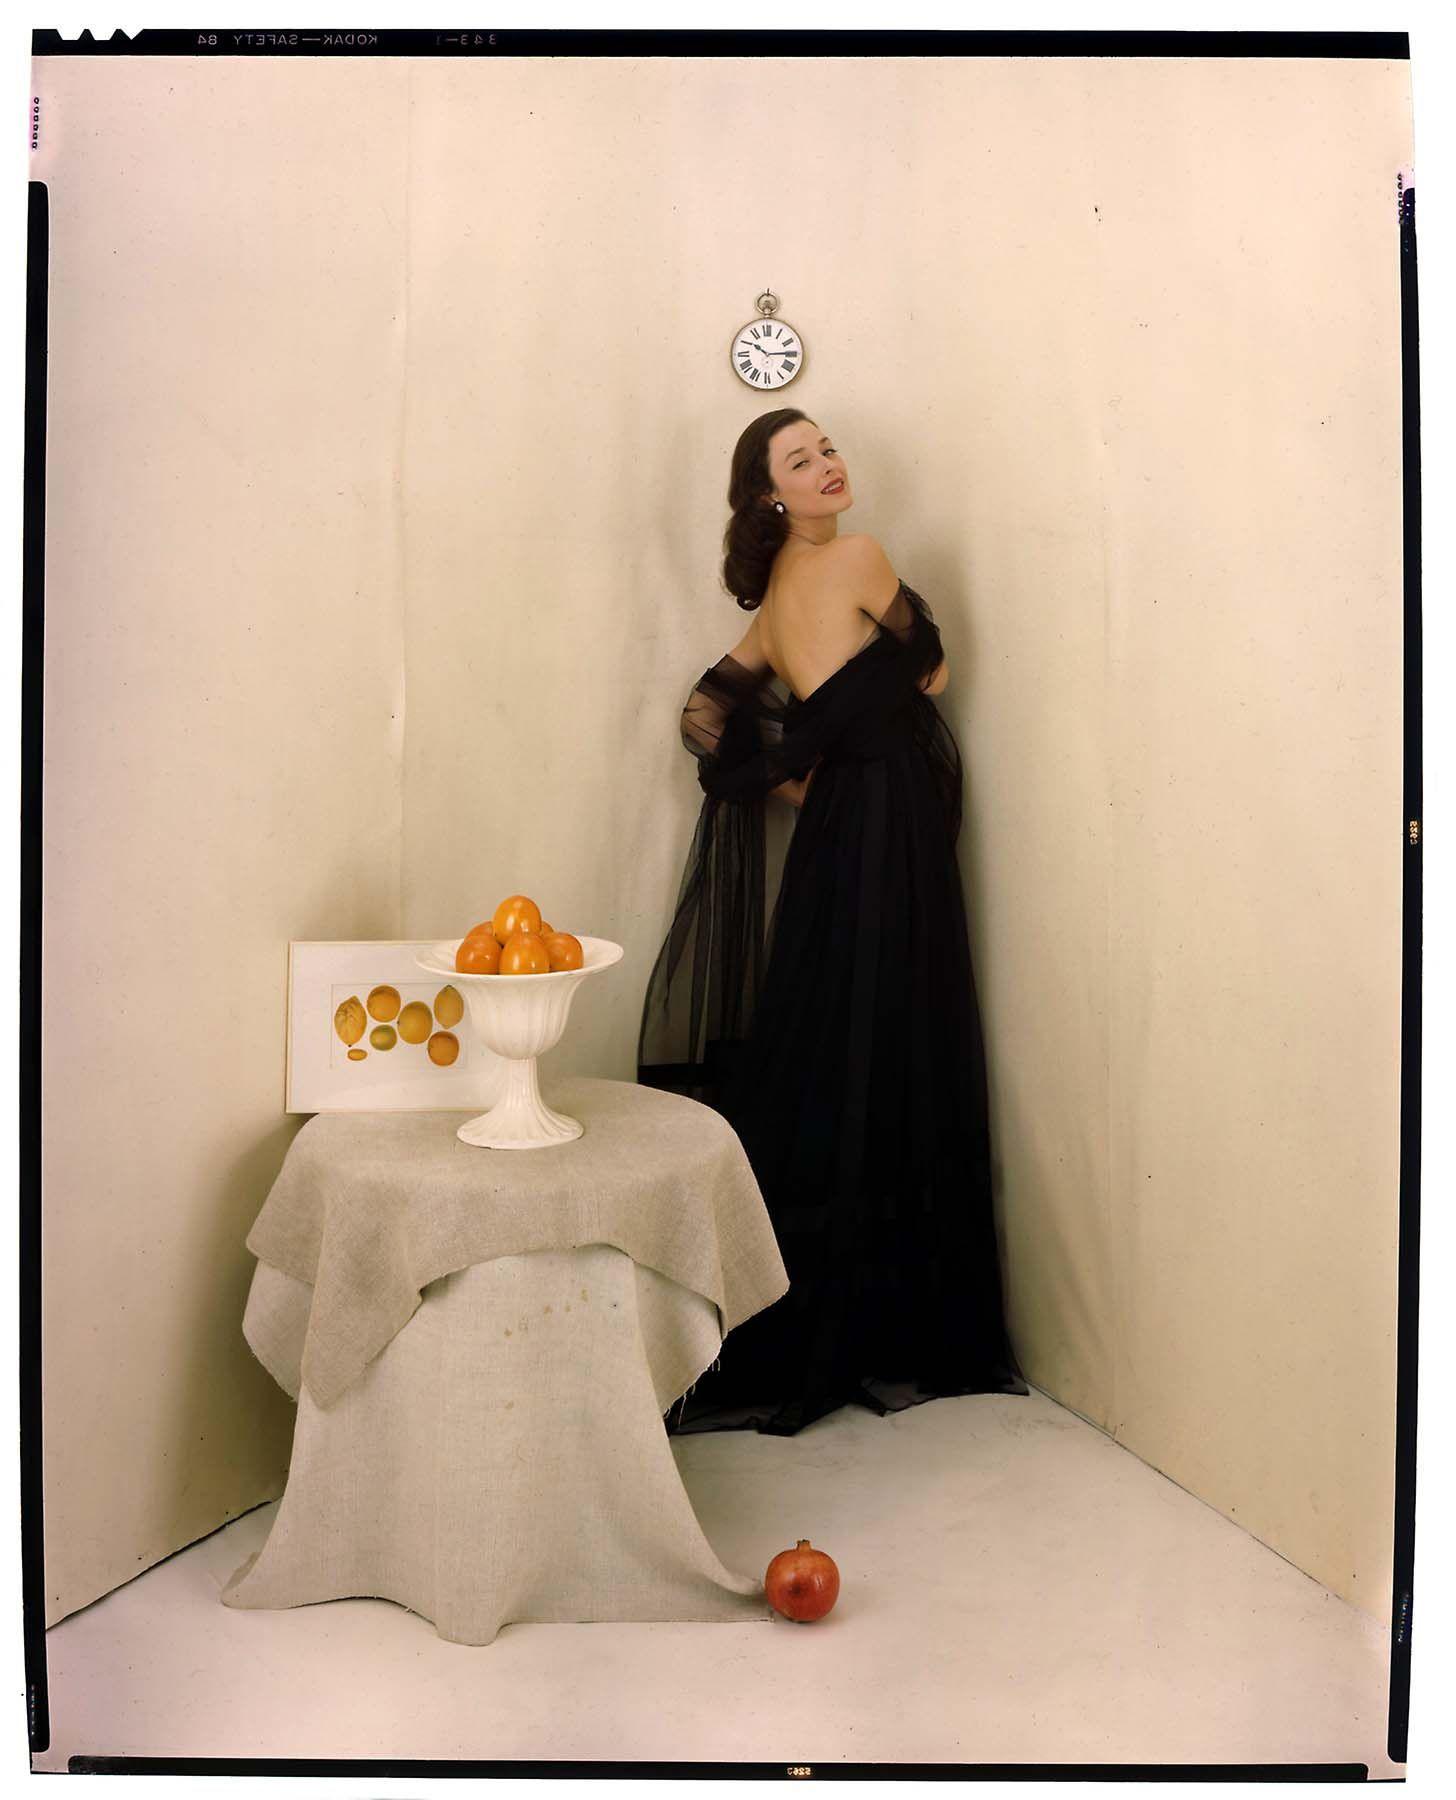 Angela Nazar,Ritz Azul (b. 1994) Hot video Nicholas Hoult (born 1989),Desiree Ross